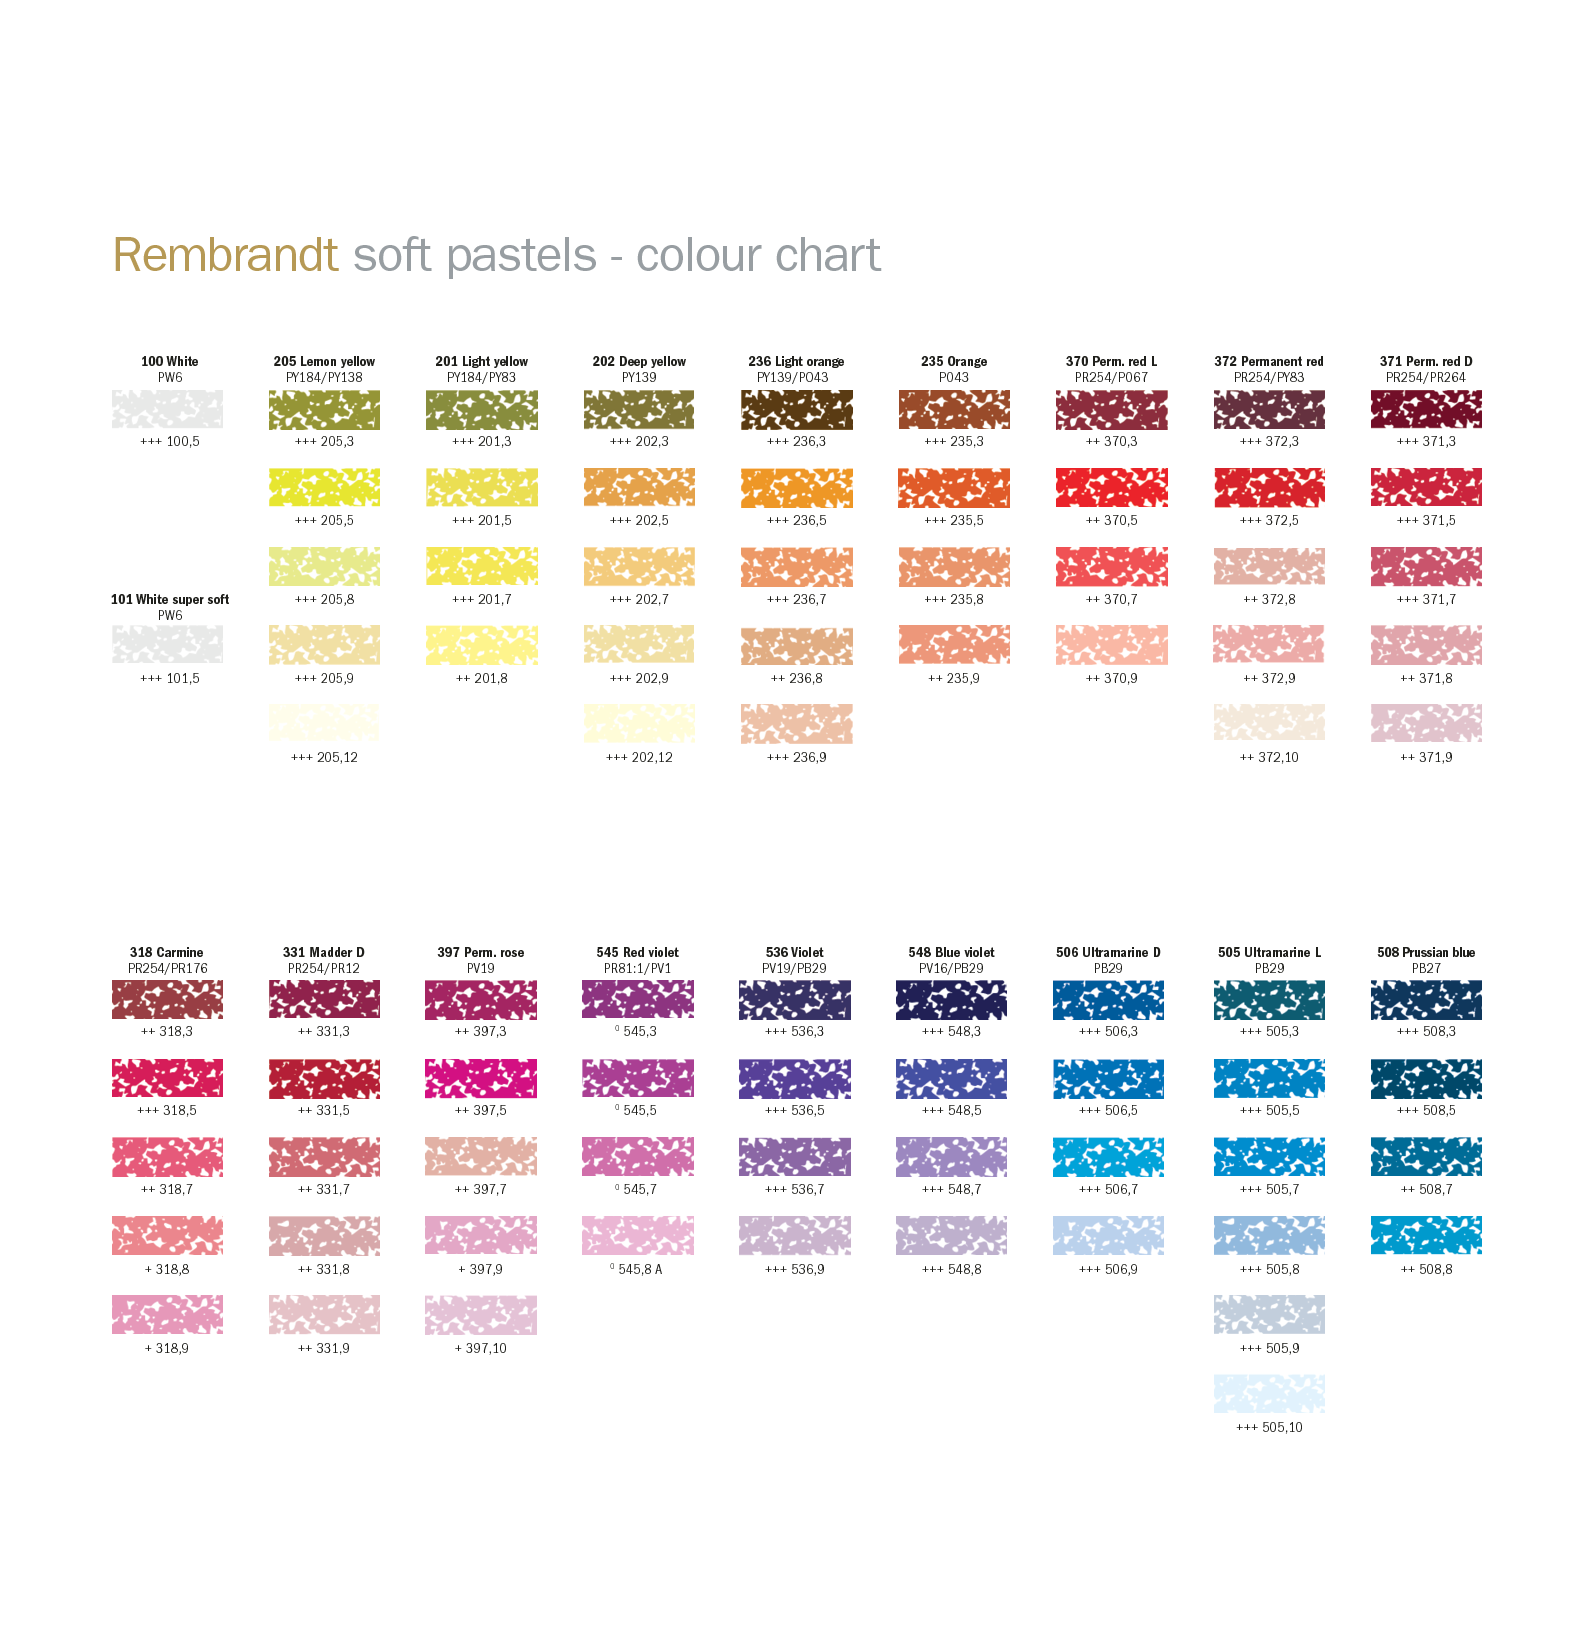 Rembrandt pastels color chart color charts pinterest colour rembrandt pastels color chart nvjuhfo Image collections